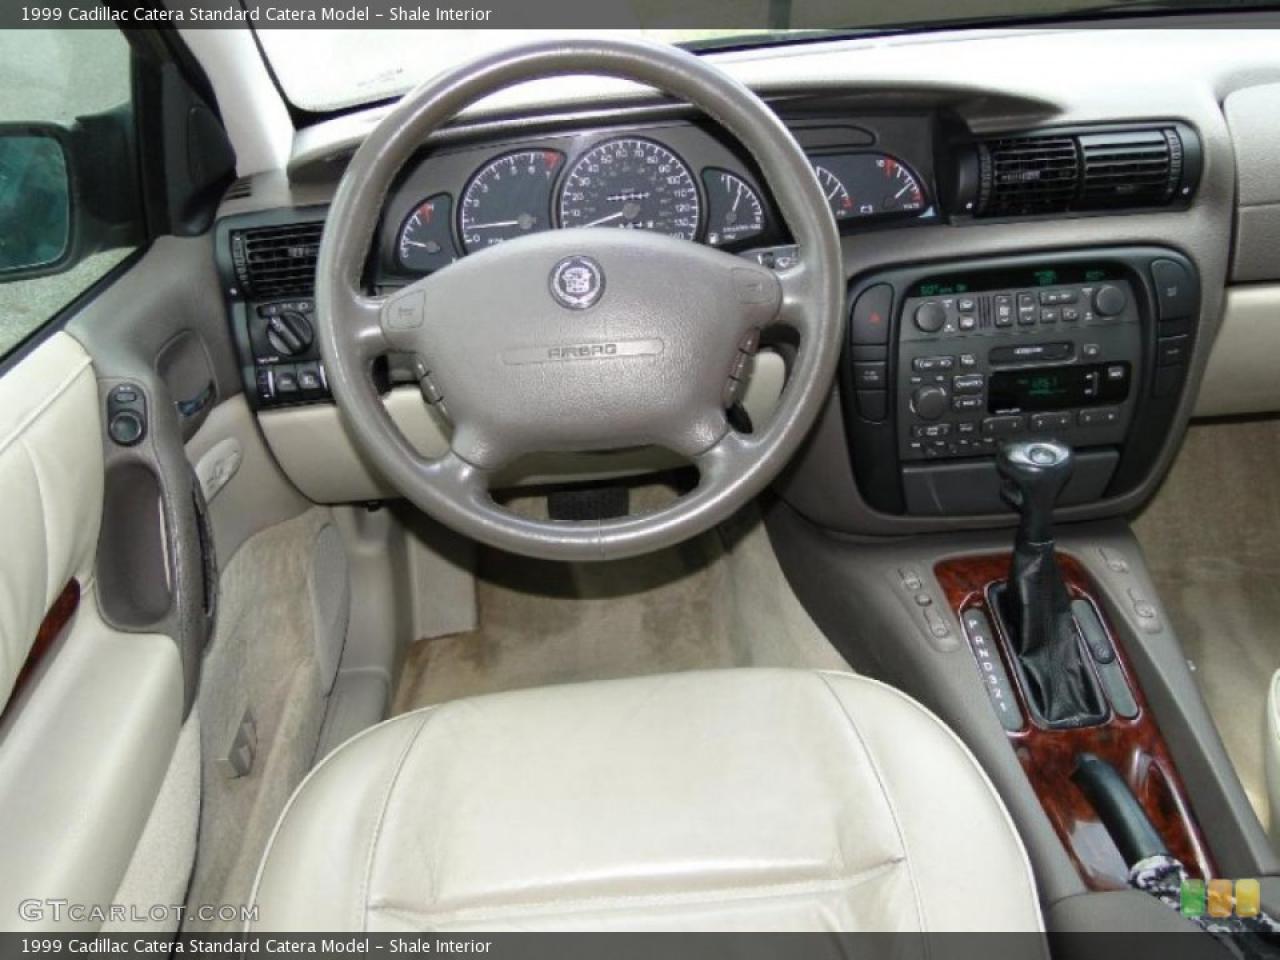 1999 Cadillac Catera 10 800 1024 1280 1600